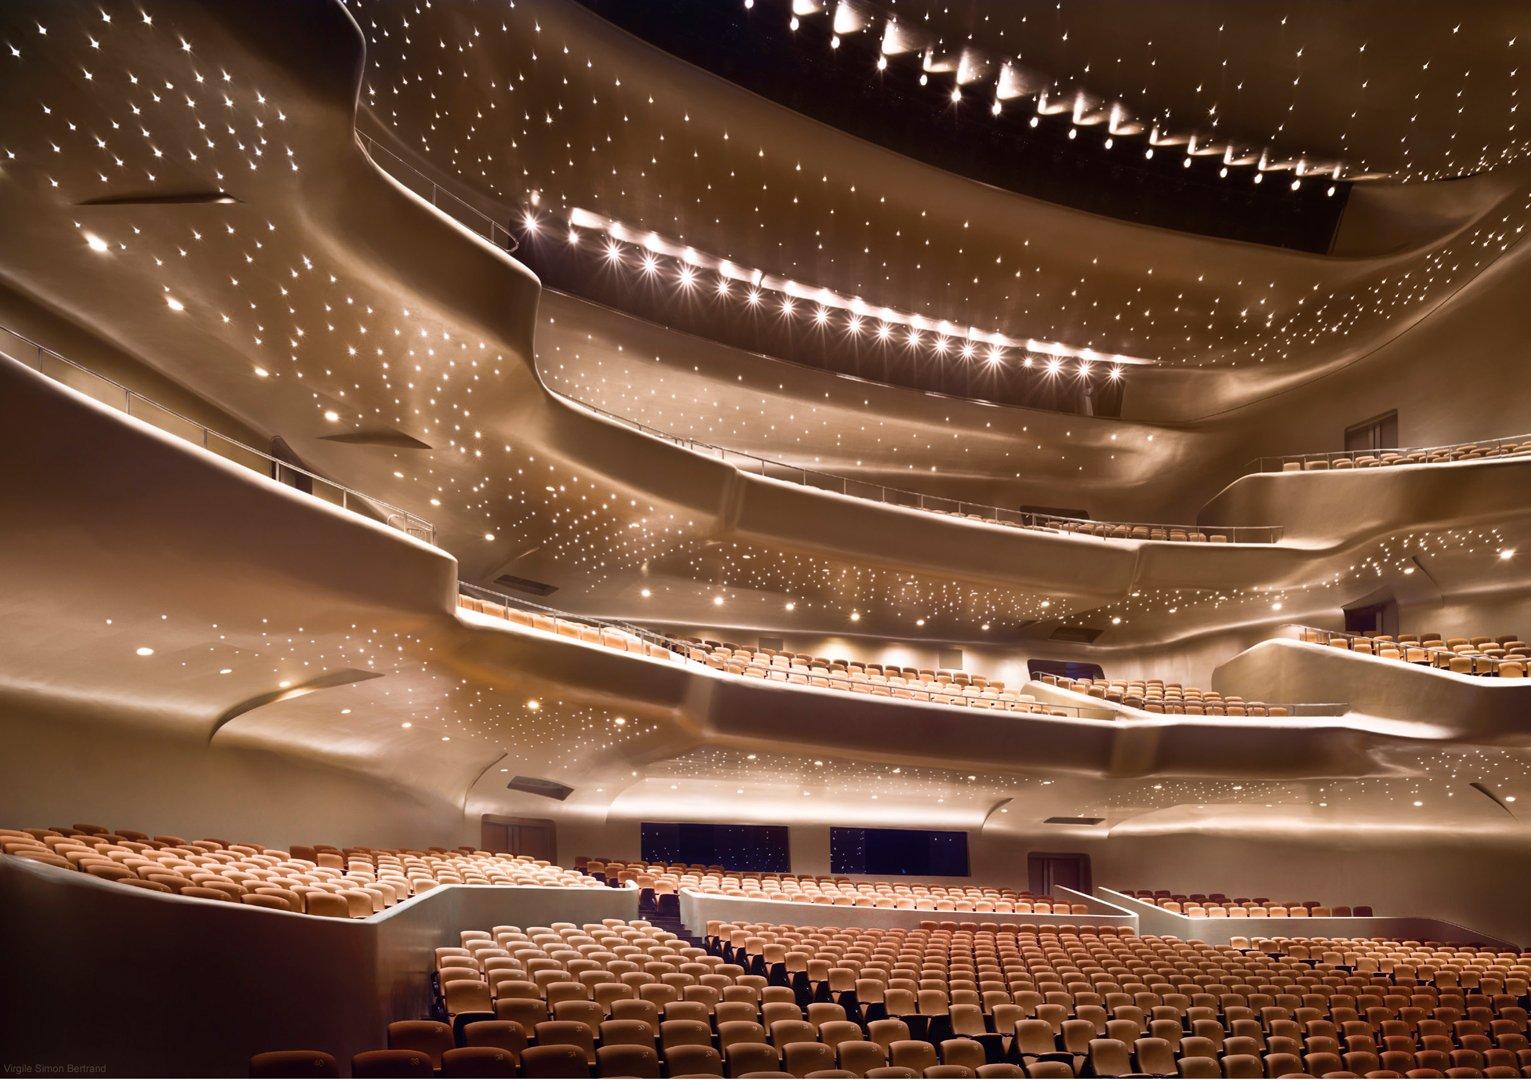 zaha-hadid-guangzhou-opera-house-2